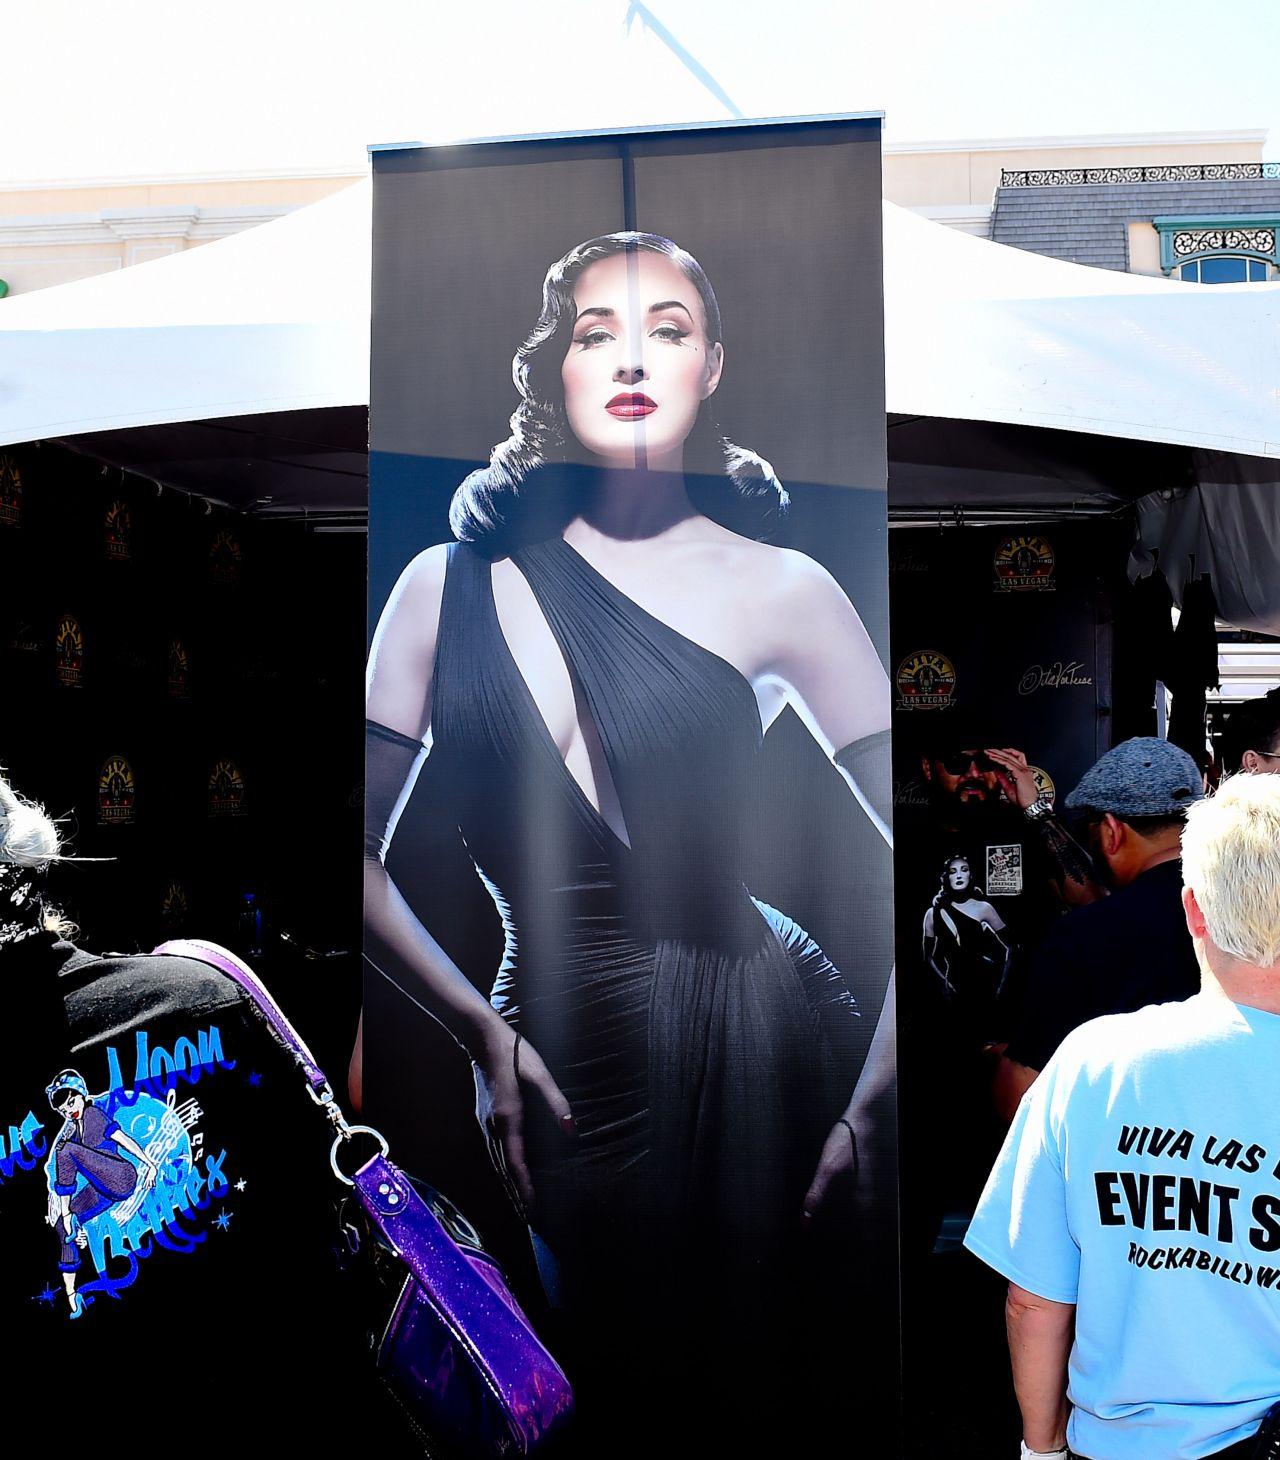 Dita Von Teese - Viva Las Vegas Rockabilly Car Show 2017